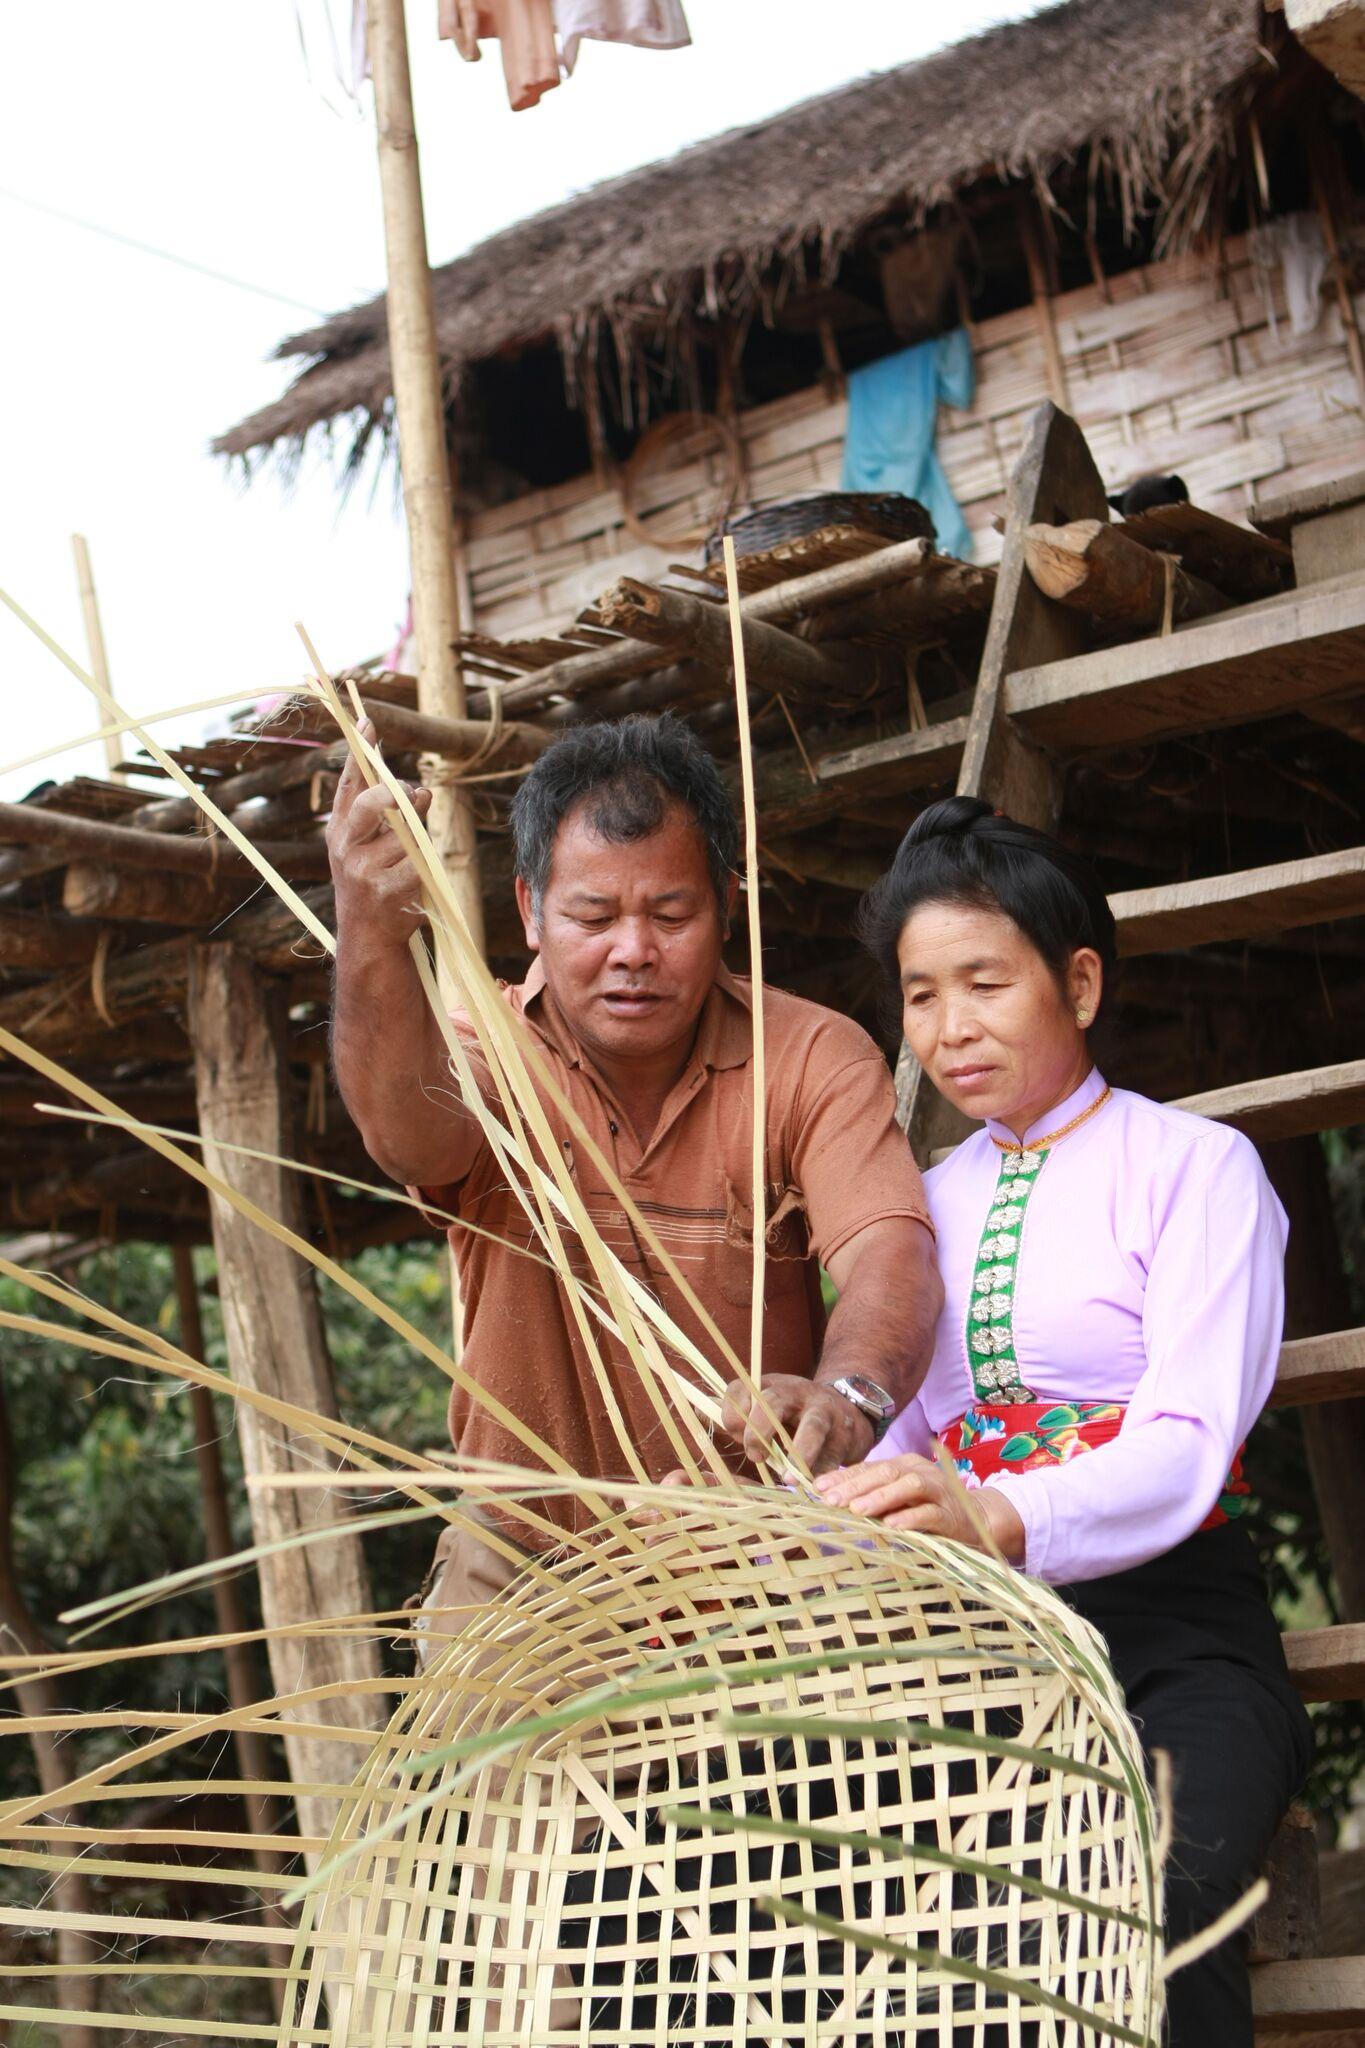 Los beneficiarios del programa de la Cooperativa Textil de Hoa Tien